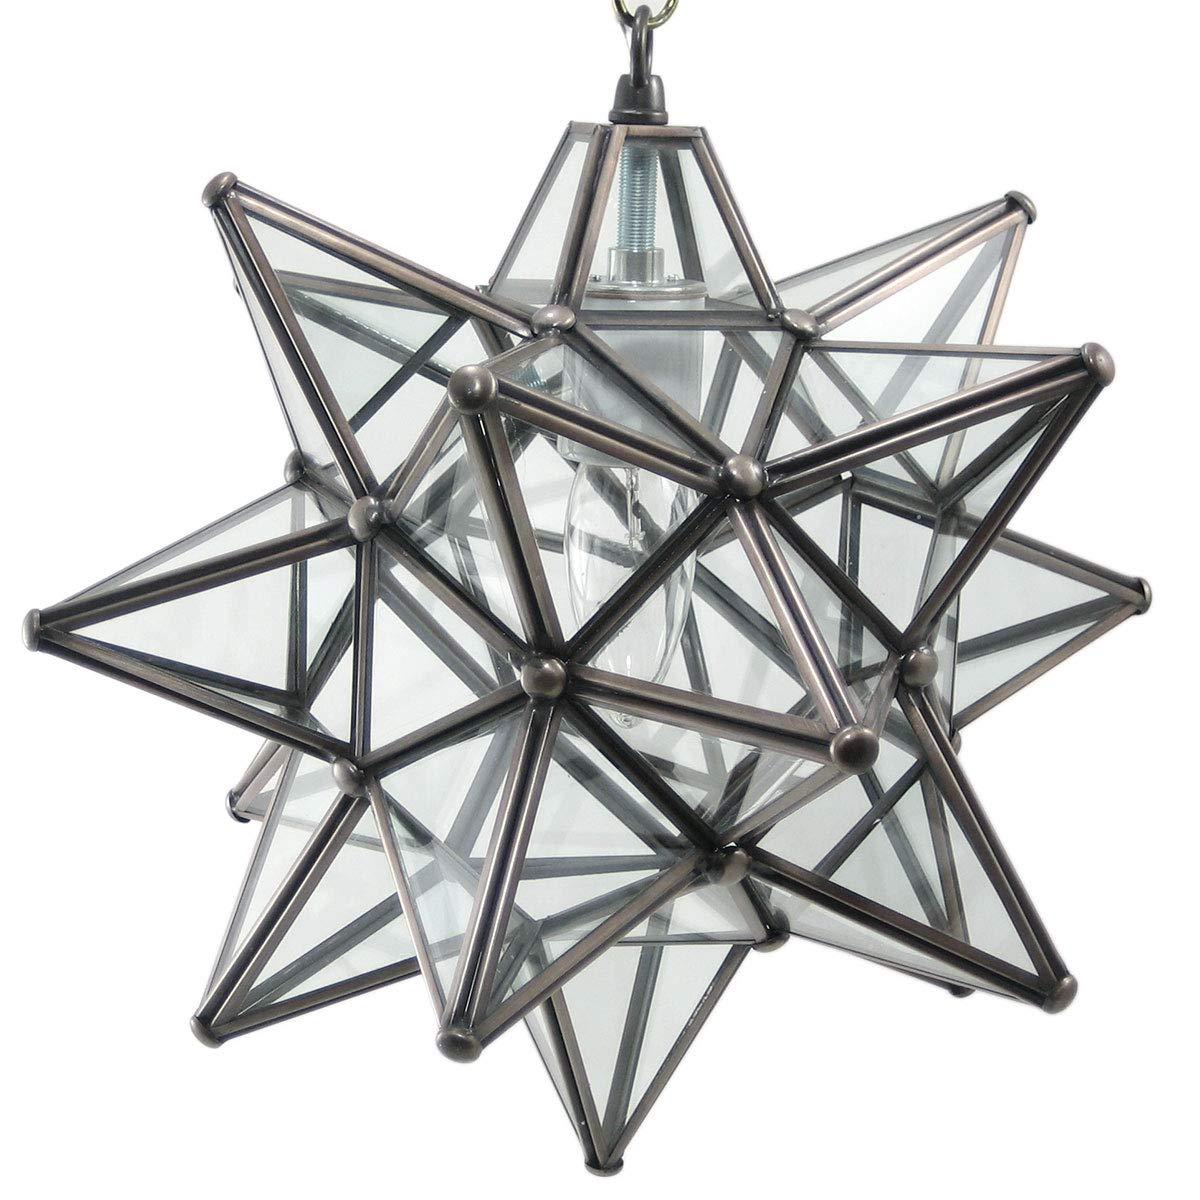 Duda home decor moravian star pendant light clear glass bronze frame 12